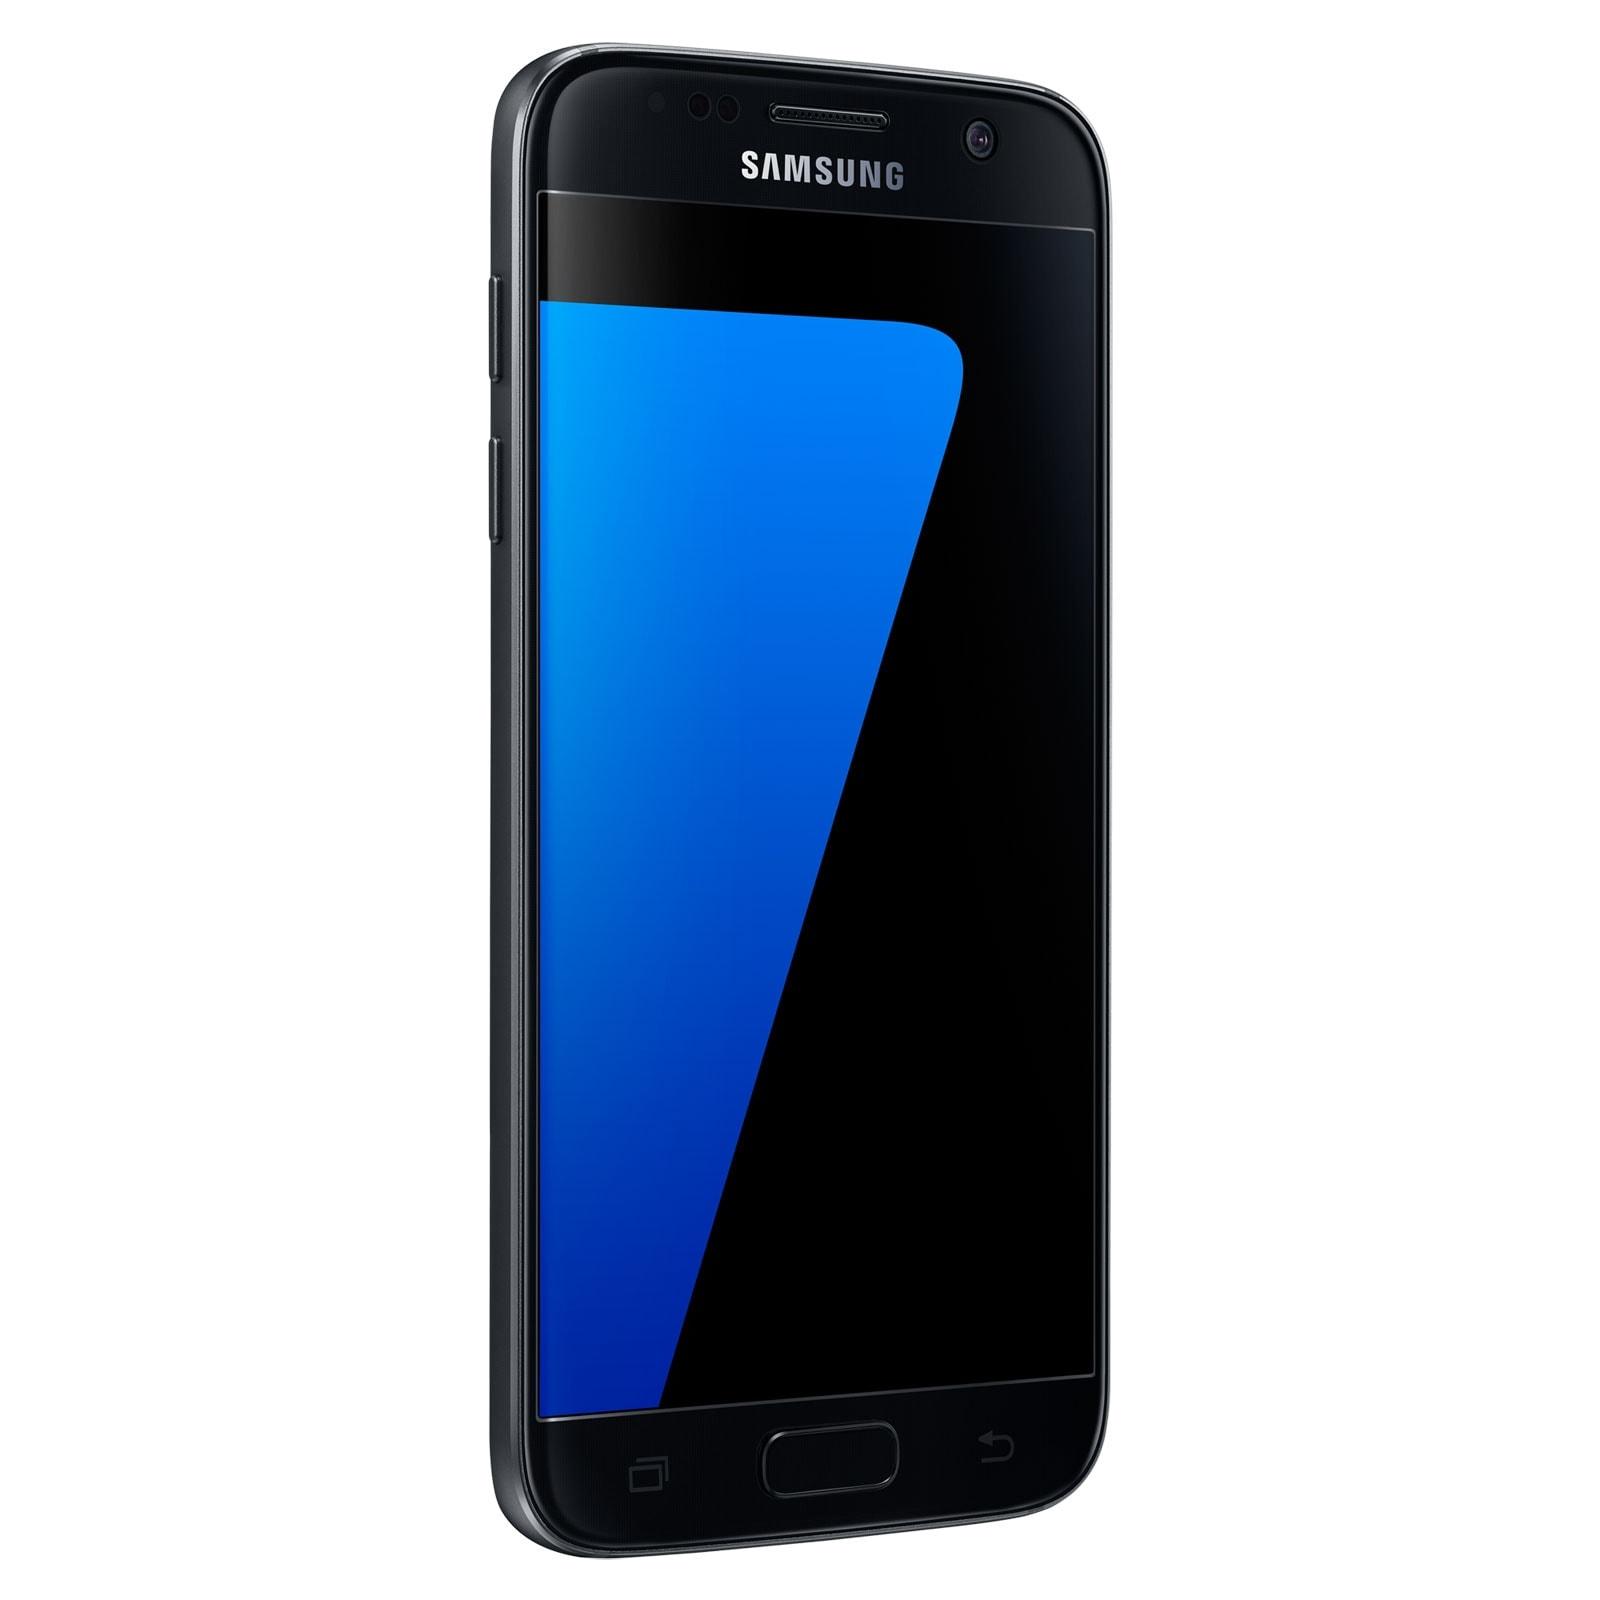 Samsung Galaxy S7 32Go G930F Black (SM-G930FZKAXEF) - Achat / Vente Téléphonie sur Cybertek.fr - 0